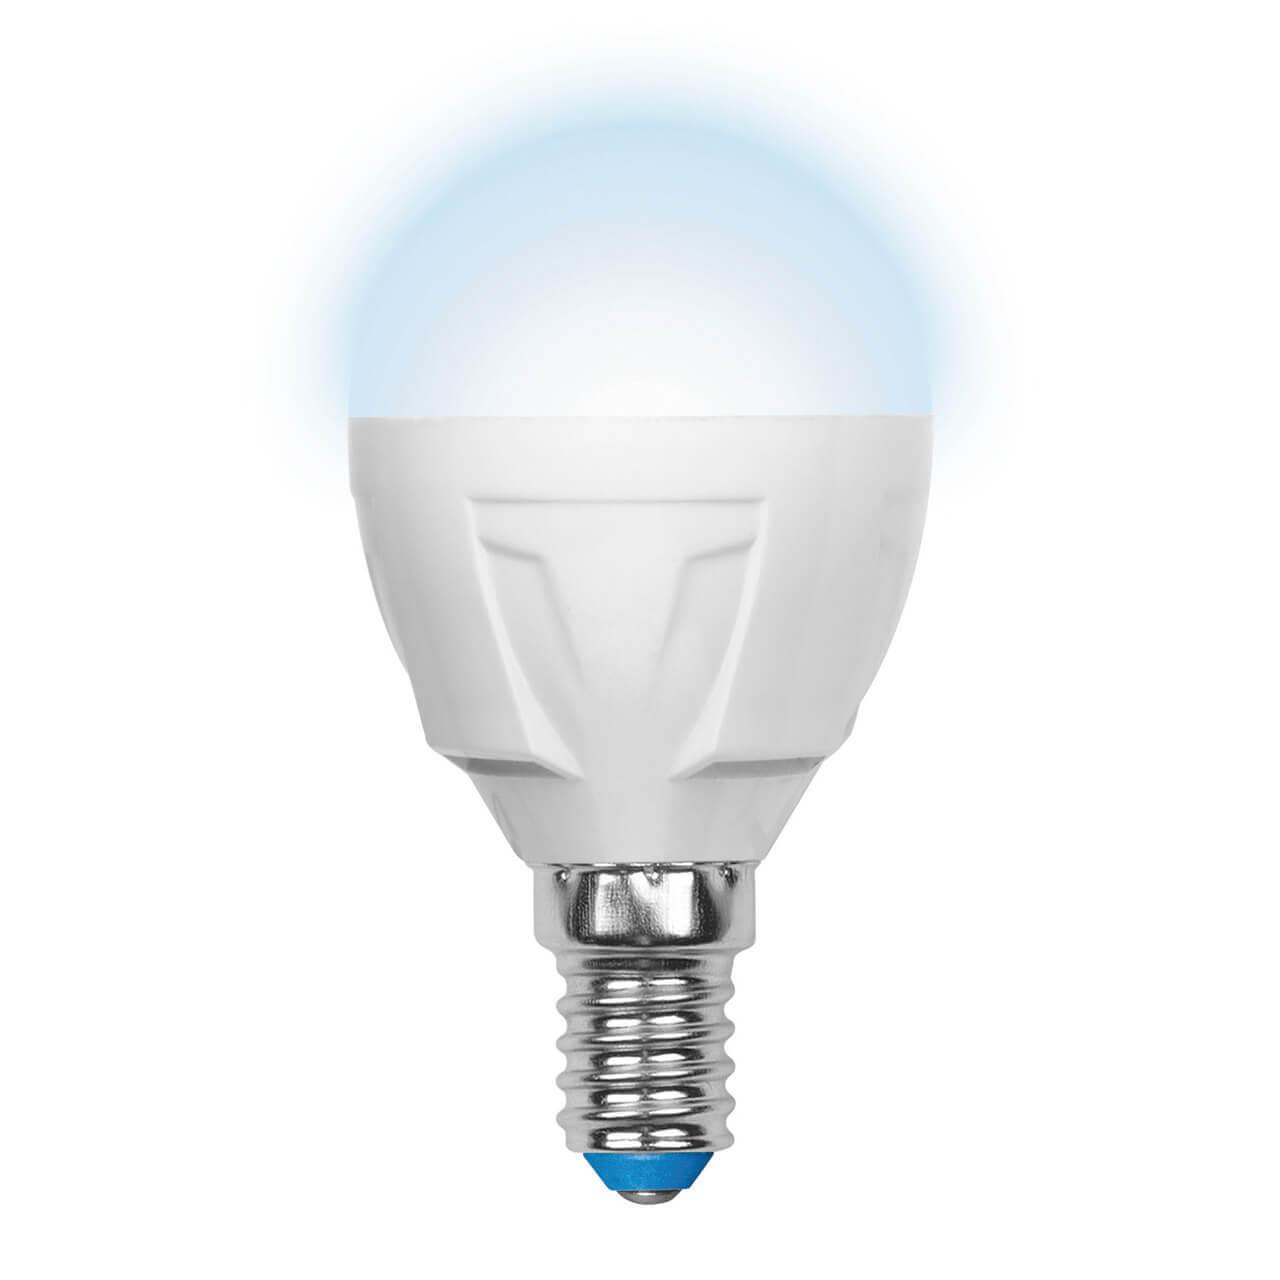 цена на Лампочка Uniel LED-G45-6W/NW/E14/FR/DIM PLP01WH Palazzo Dim Globe (Диммирование)